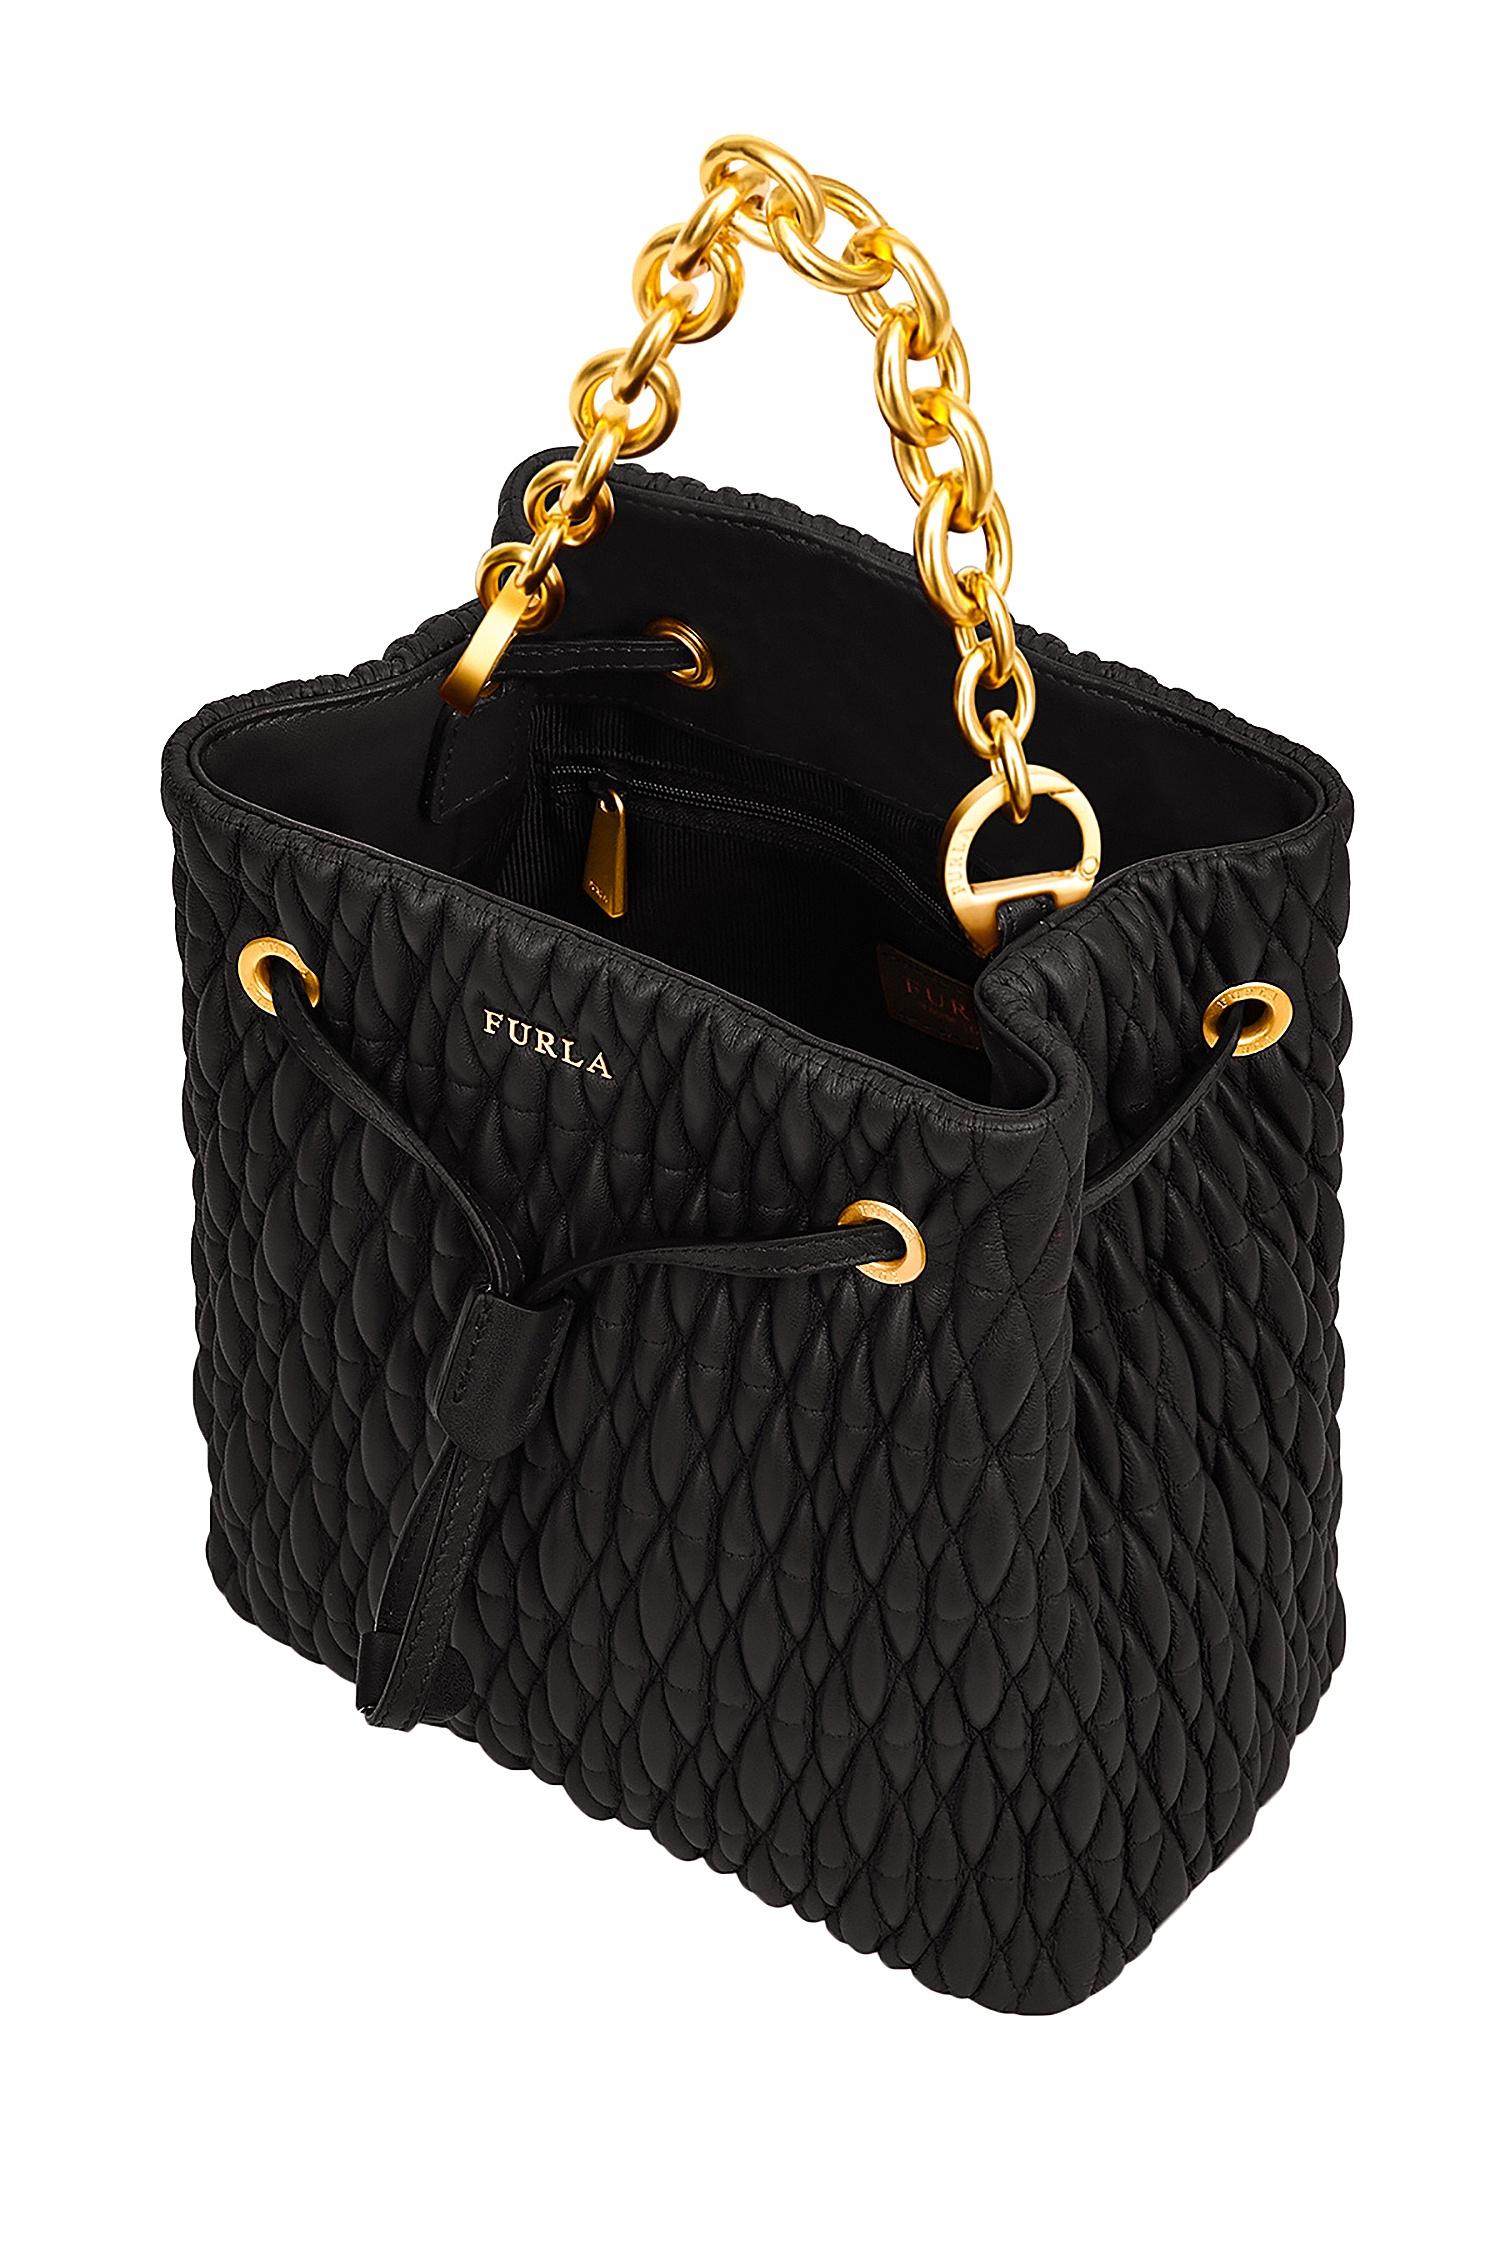 f58f72e0f1ea Черная стеганая сумка-торба Stacy Cometa FURLA – купить в интернет ...